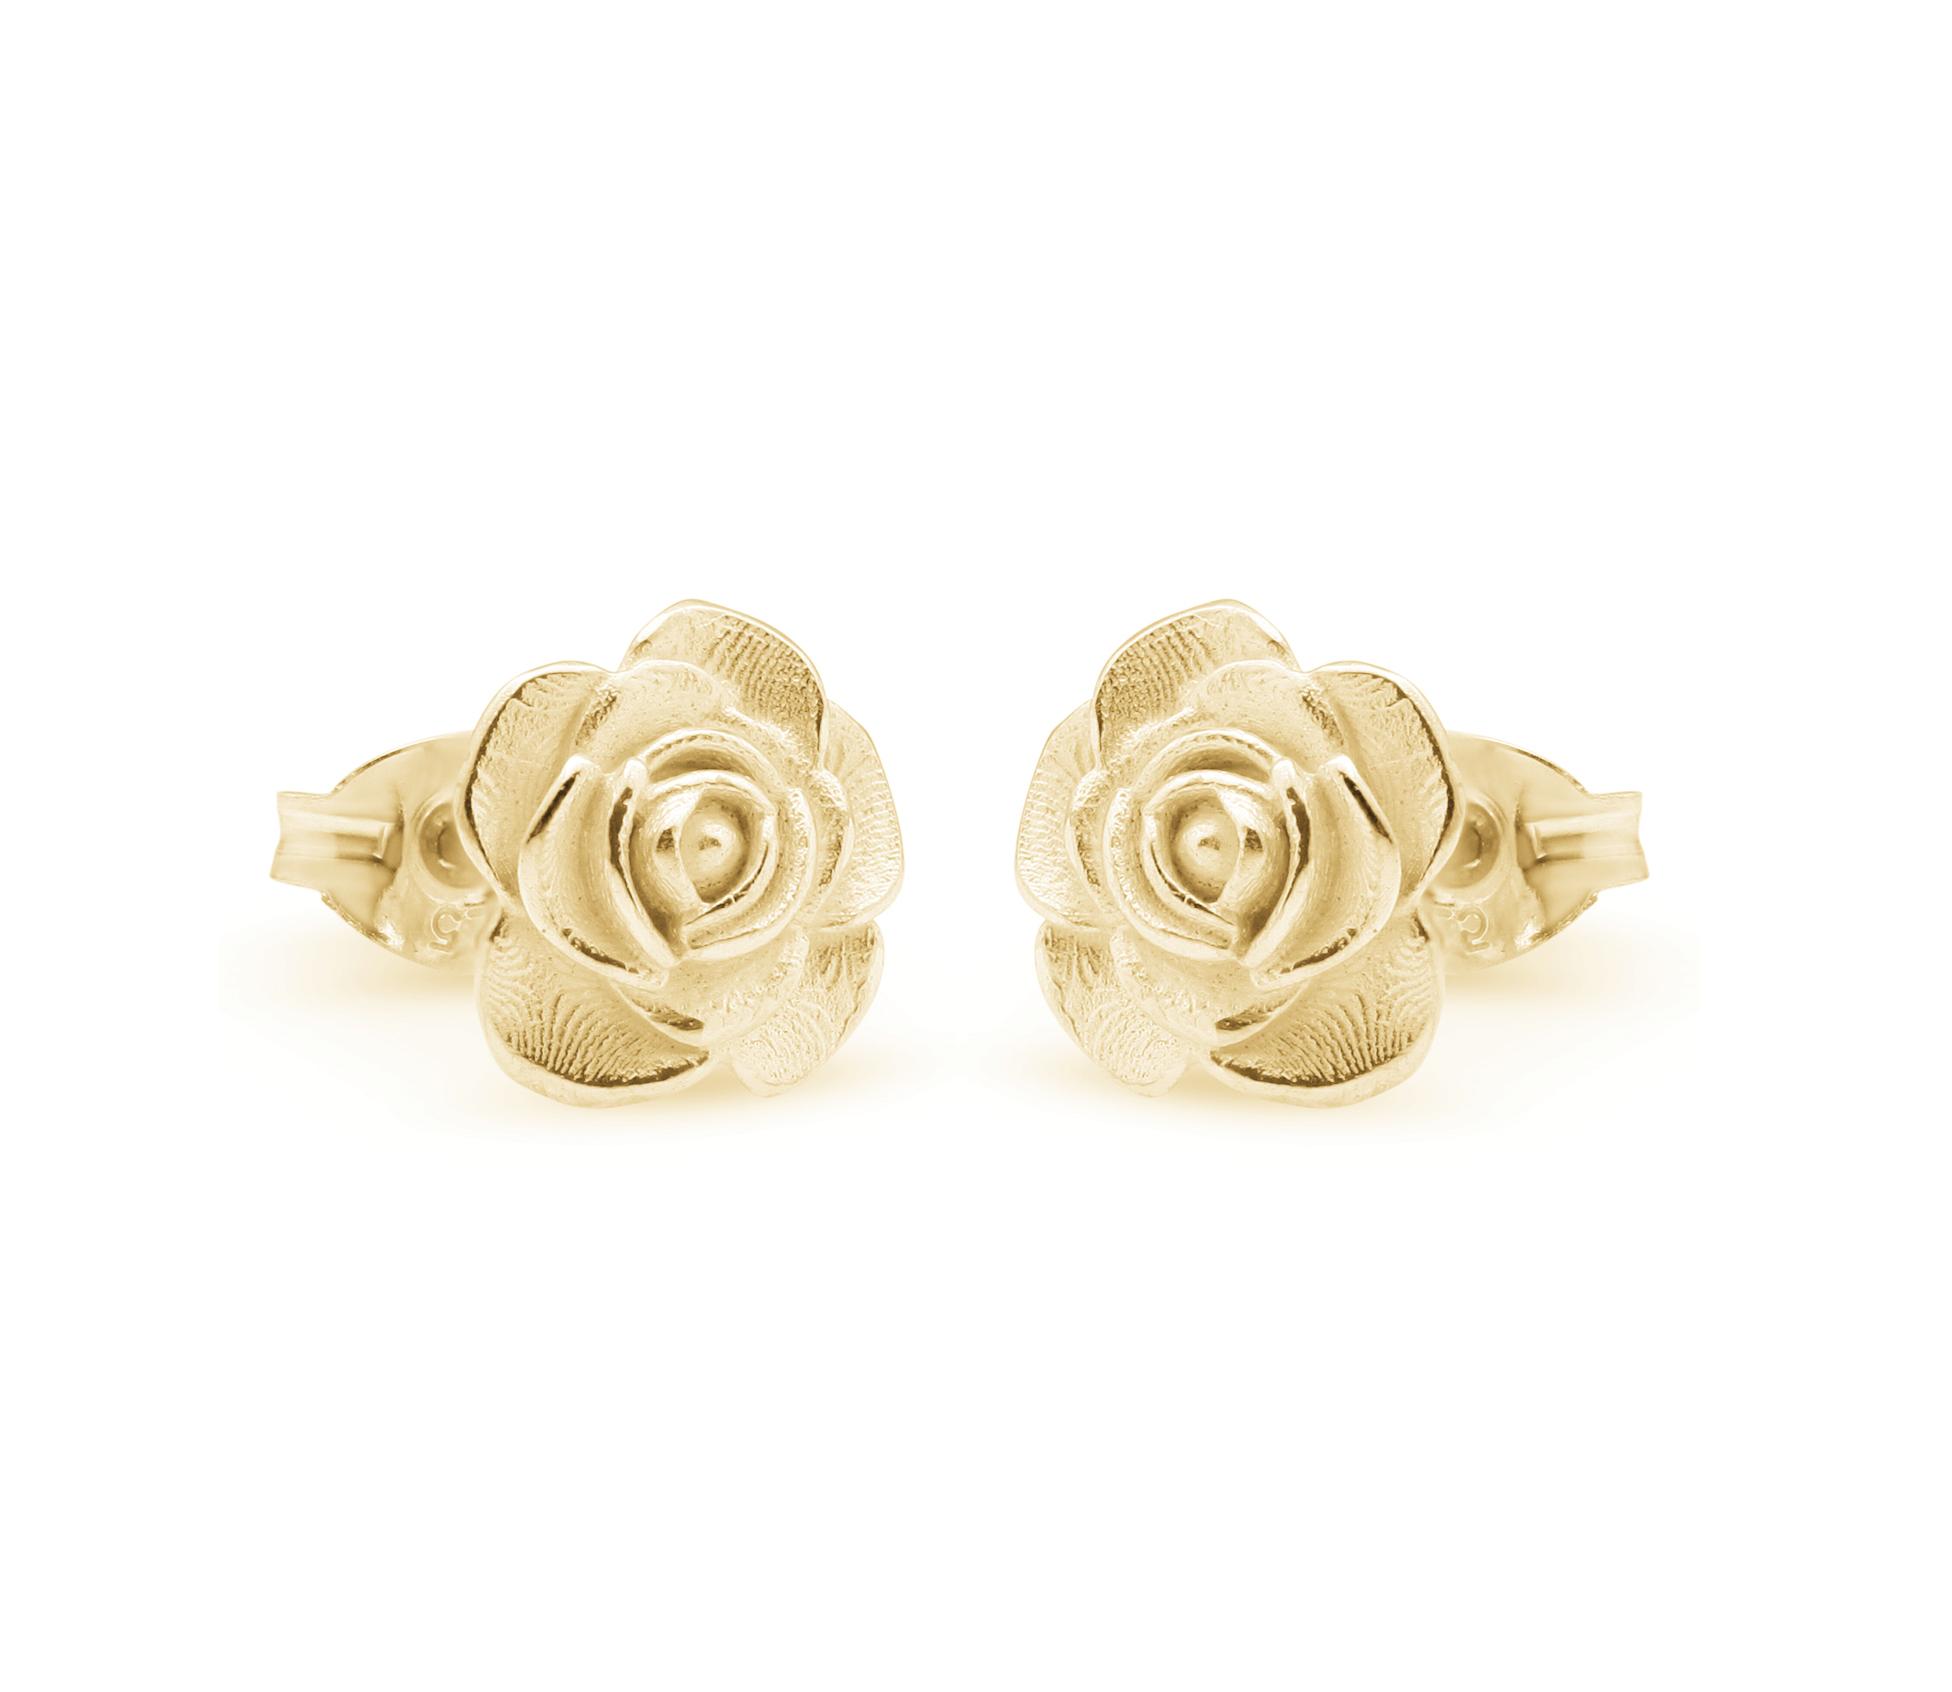 ed374aa69 Rose Stud Earrings 9ct yellow gold | MICHAELJOHN - Fine Jewellery Matakana